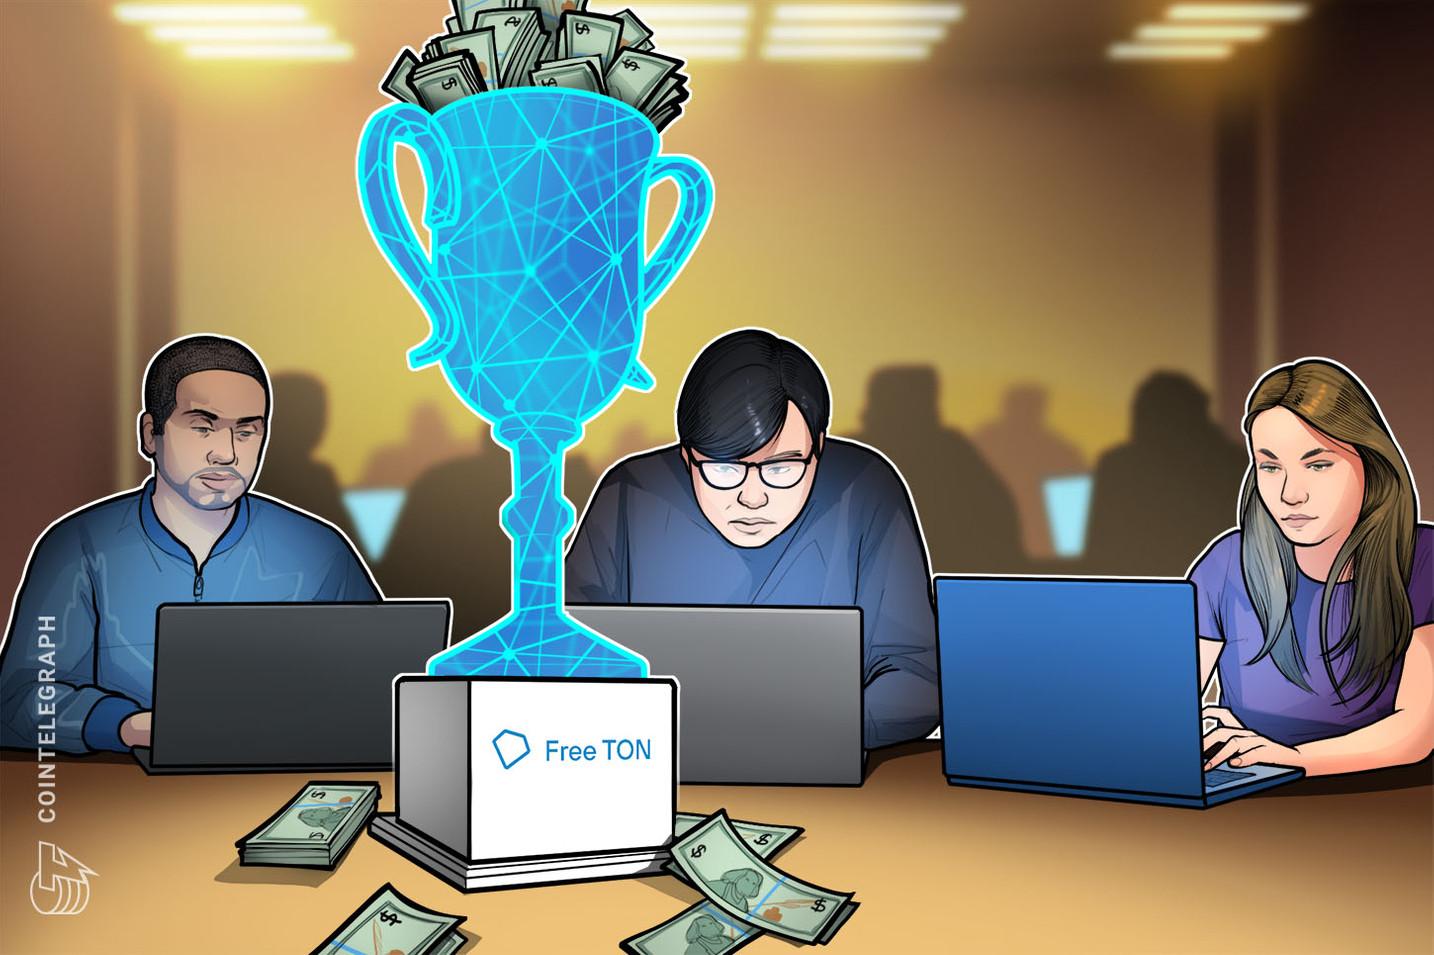 zk-SNARKS竞赛为Zcash隐私协议提供25万美元奖励